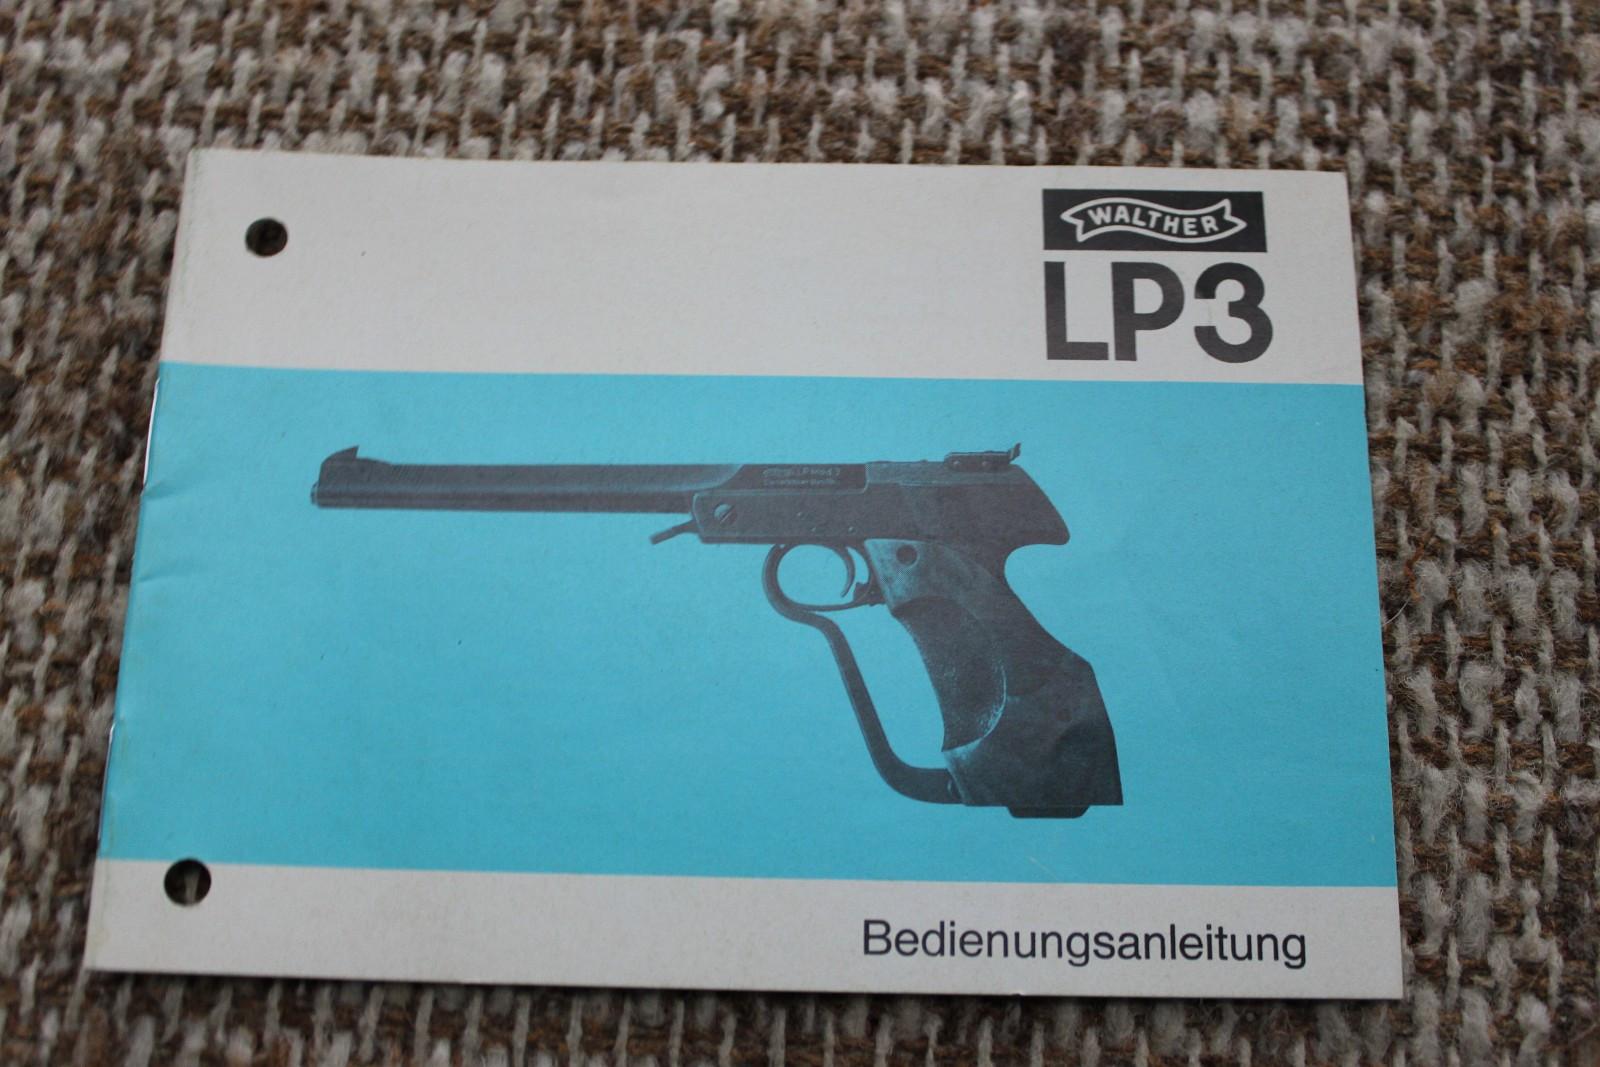 Original Walther LP3 instruksjons og deleliste - Sandnes  - Original instruksjons og deleliste Walther LP3 luftpistol. Totalt 19 sider. Frakt kommer i tillegg med kr. 25,-. - Sandnes